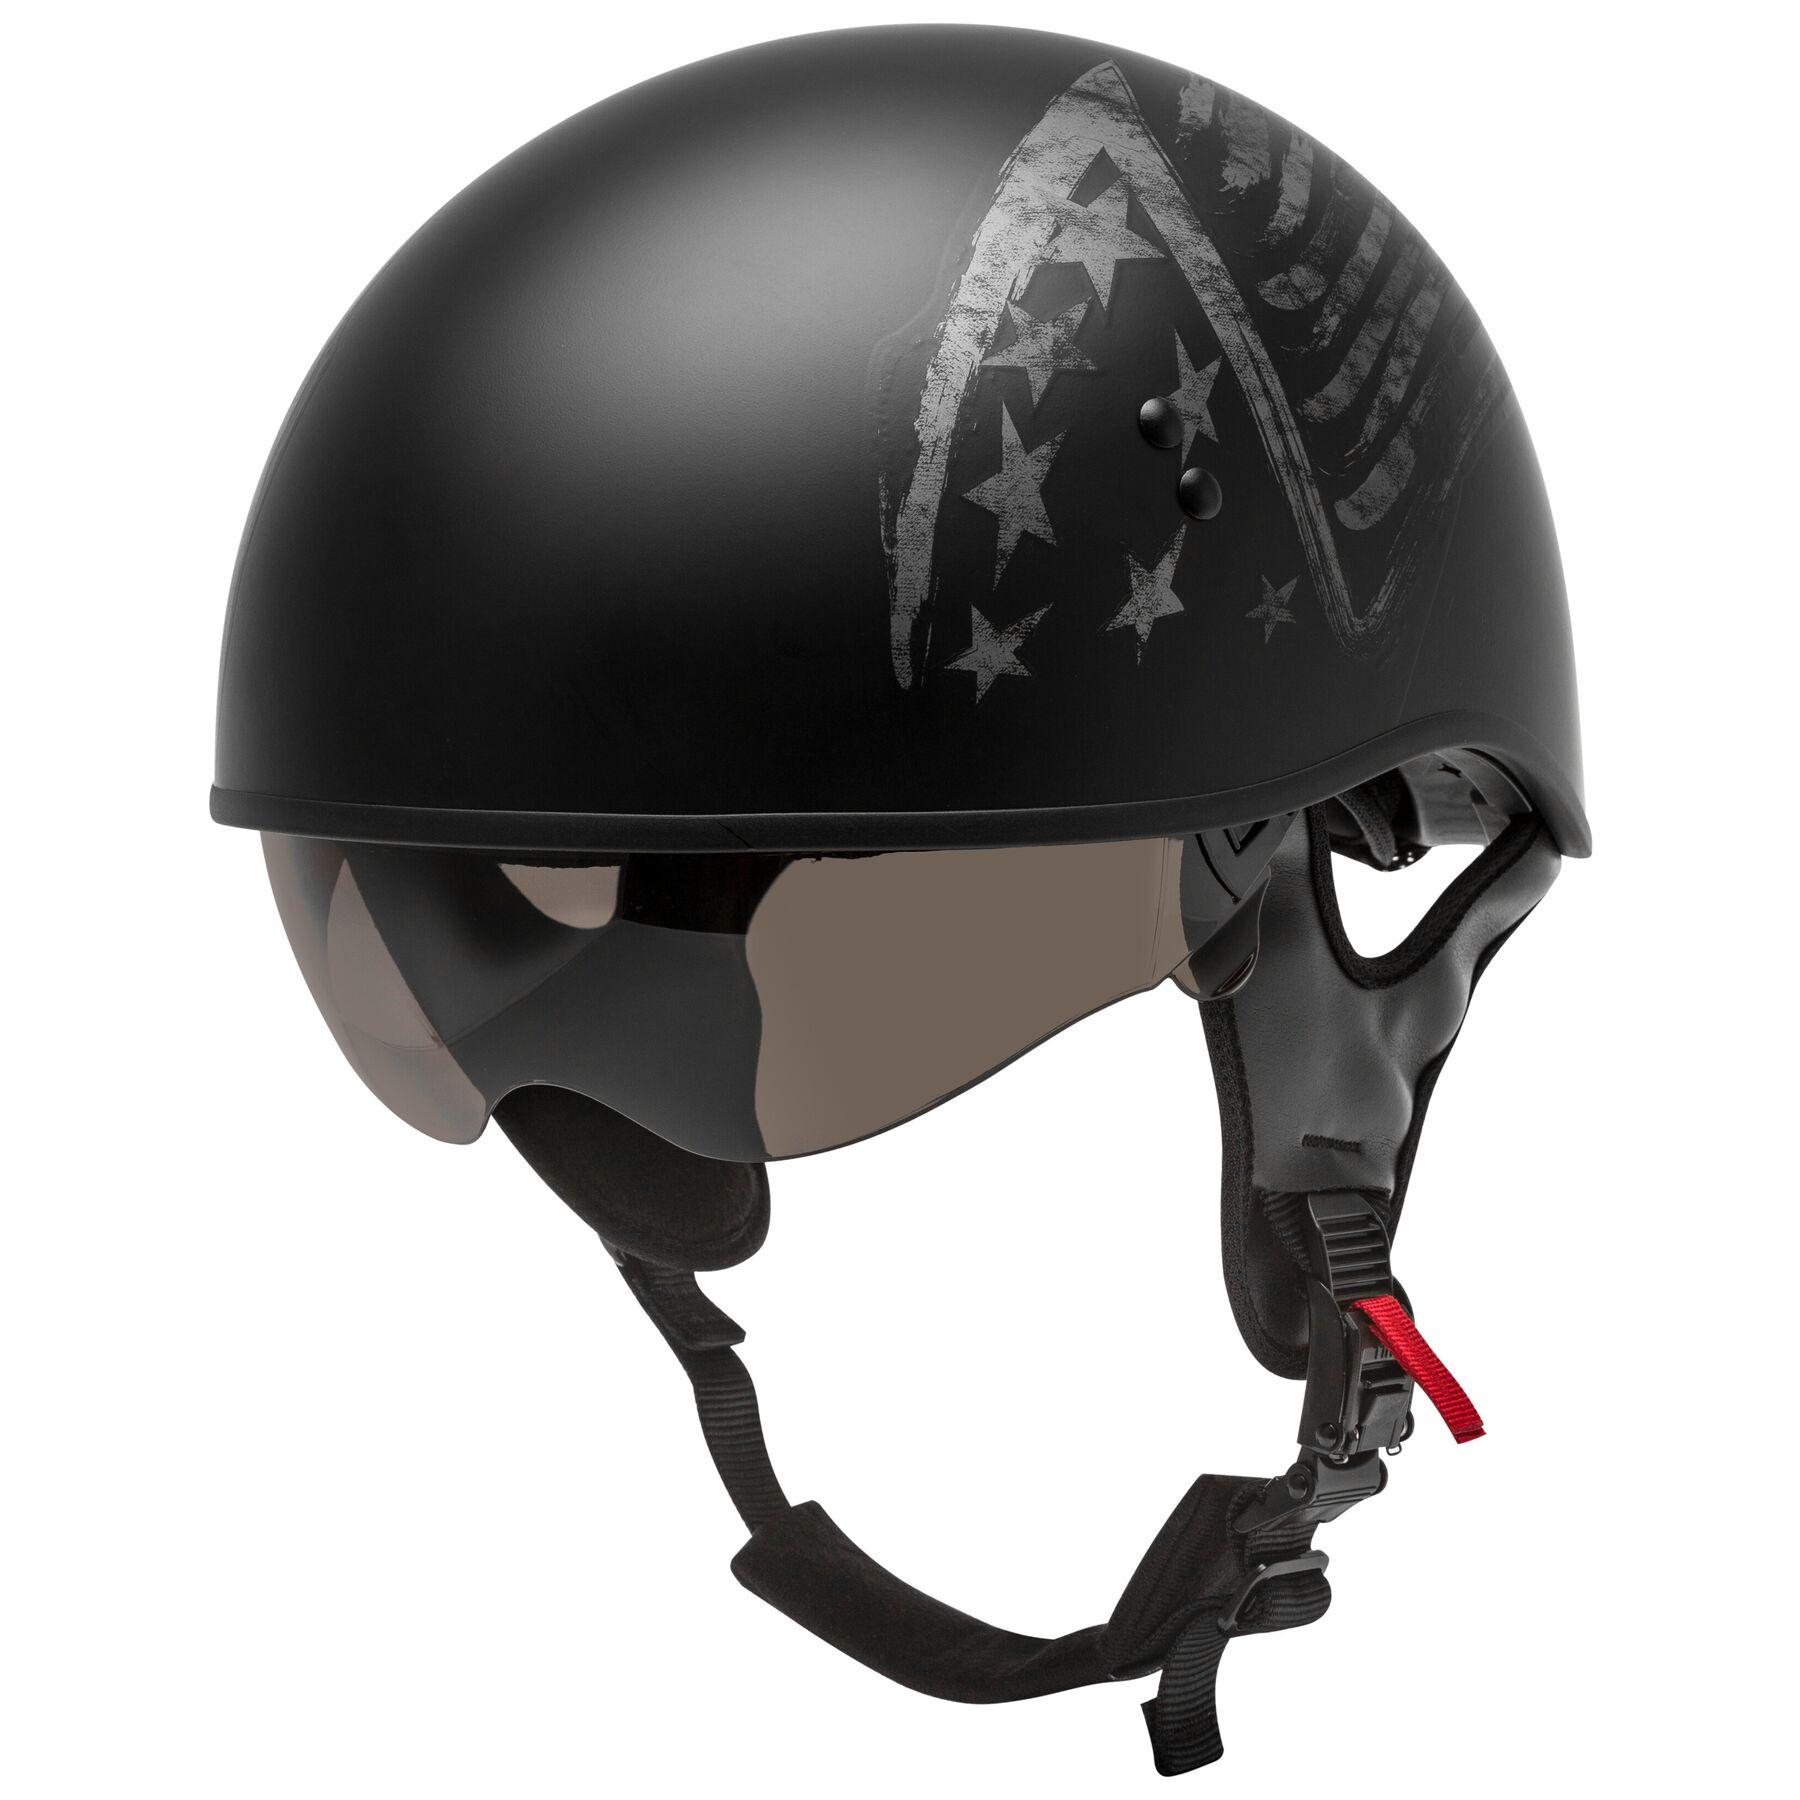 GMAX GM 65 Solid Full Dressed Half Helmet